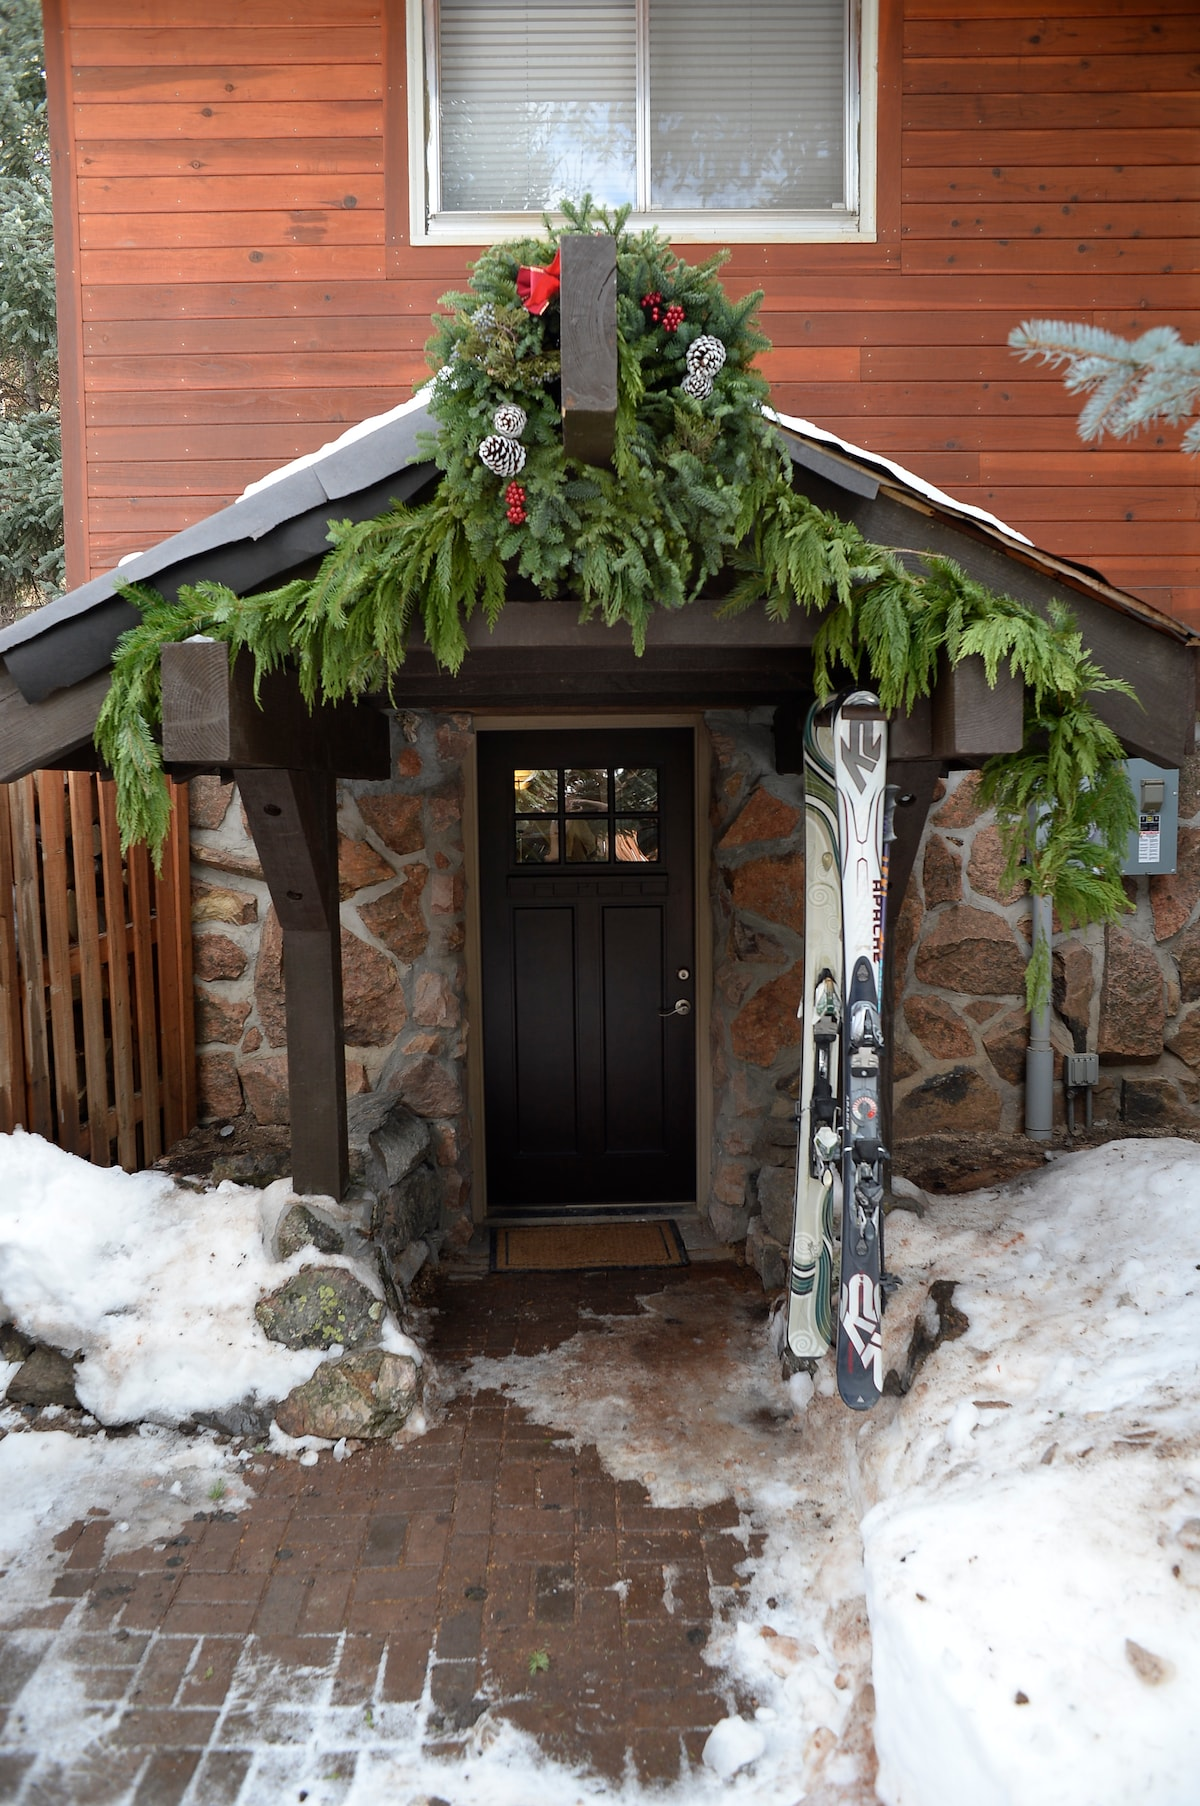 The Vail Alpine Studio